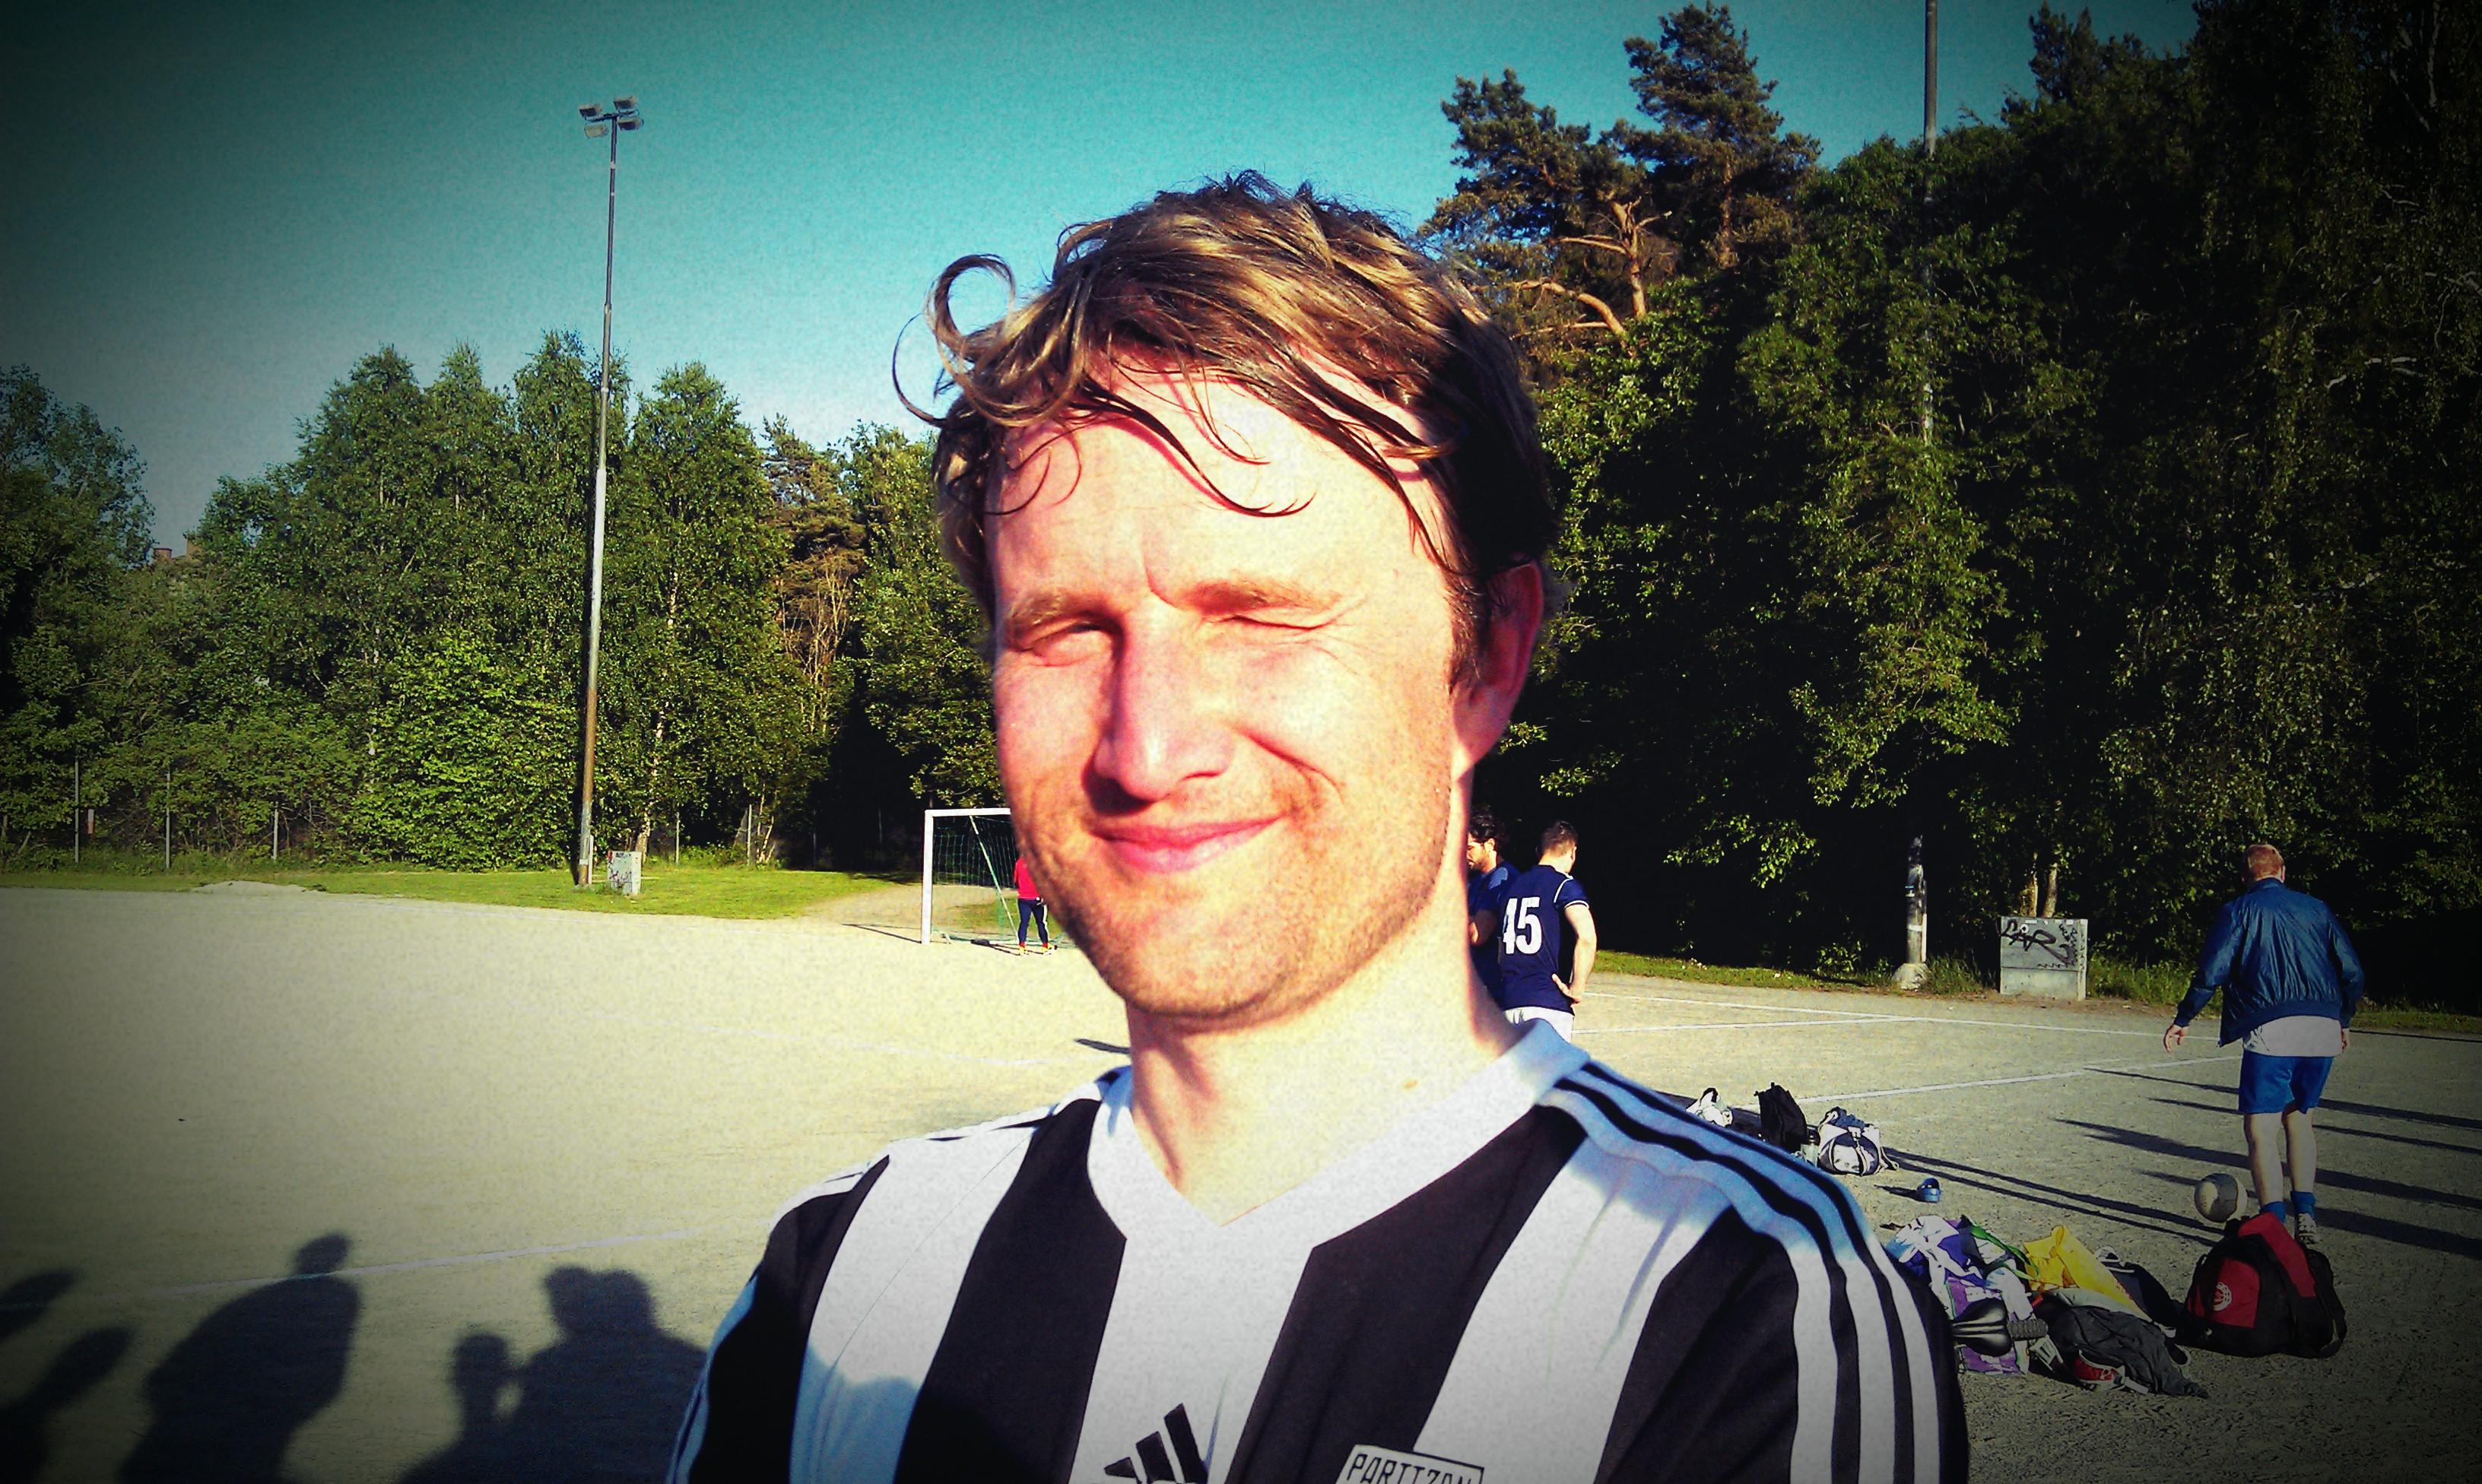 Partizans tranare efter matchen